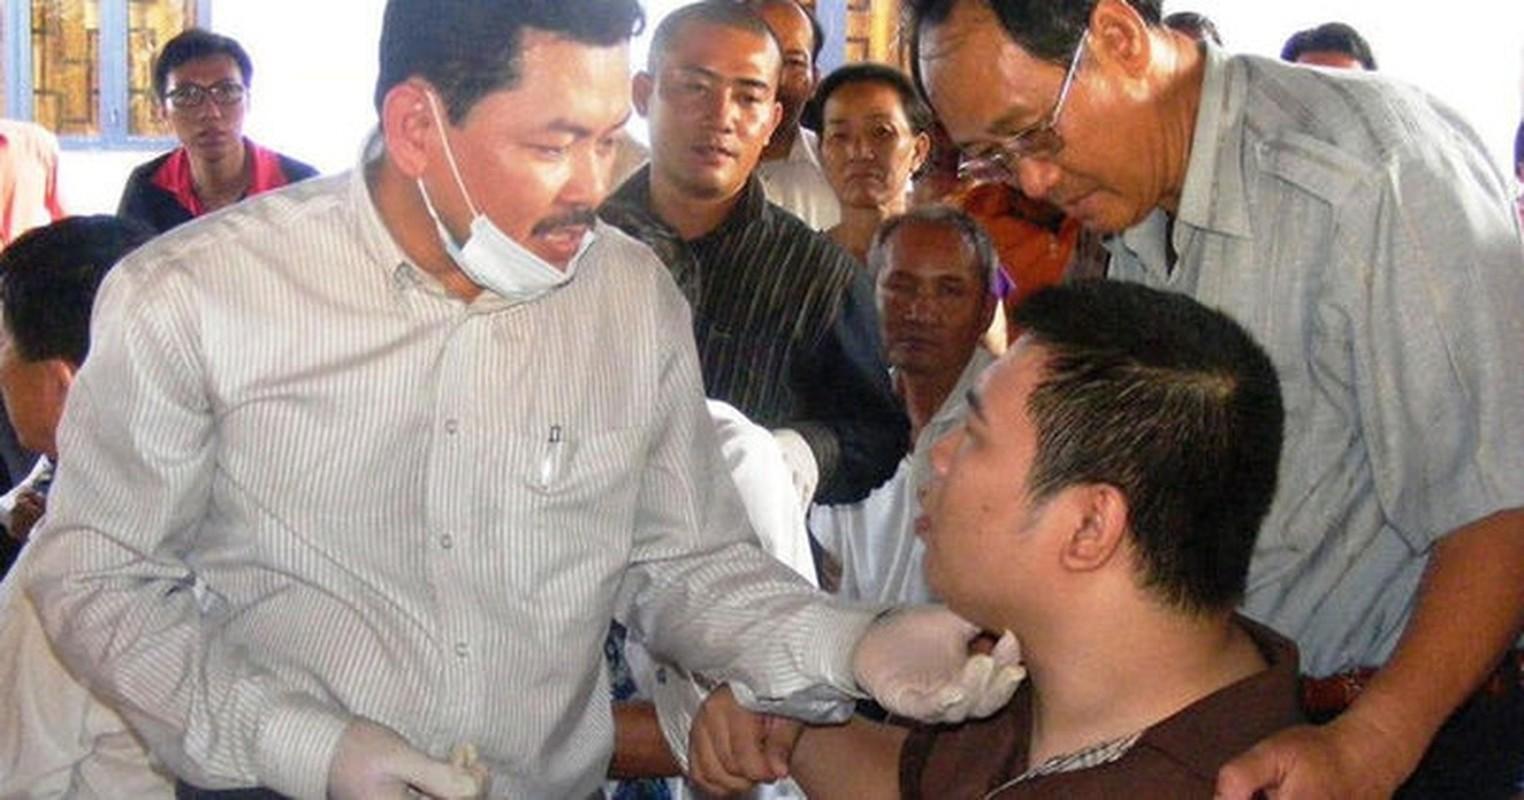 Ba Phuong Hang to Vo Hoang Yen lua dao: Dieu tra lai... co khoi to?-Hinh-13